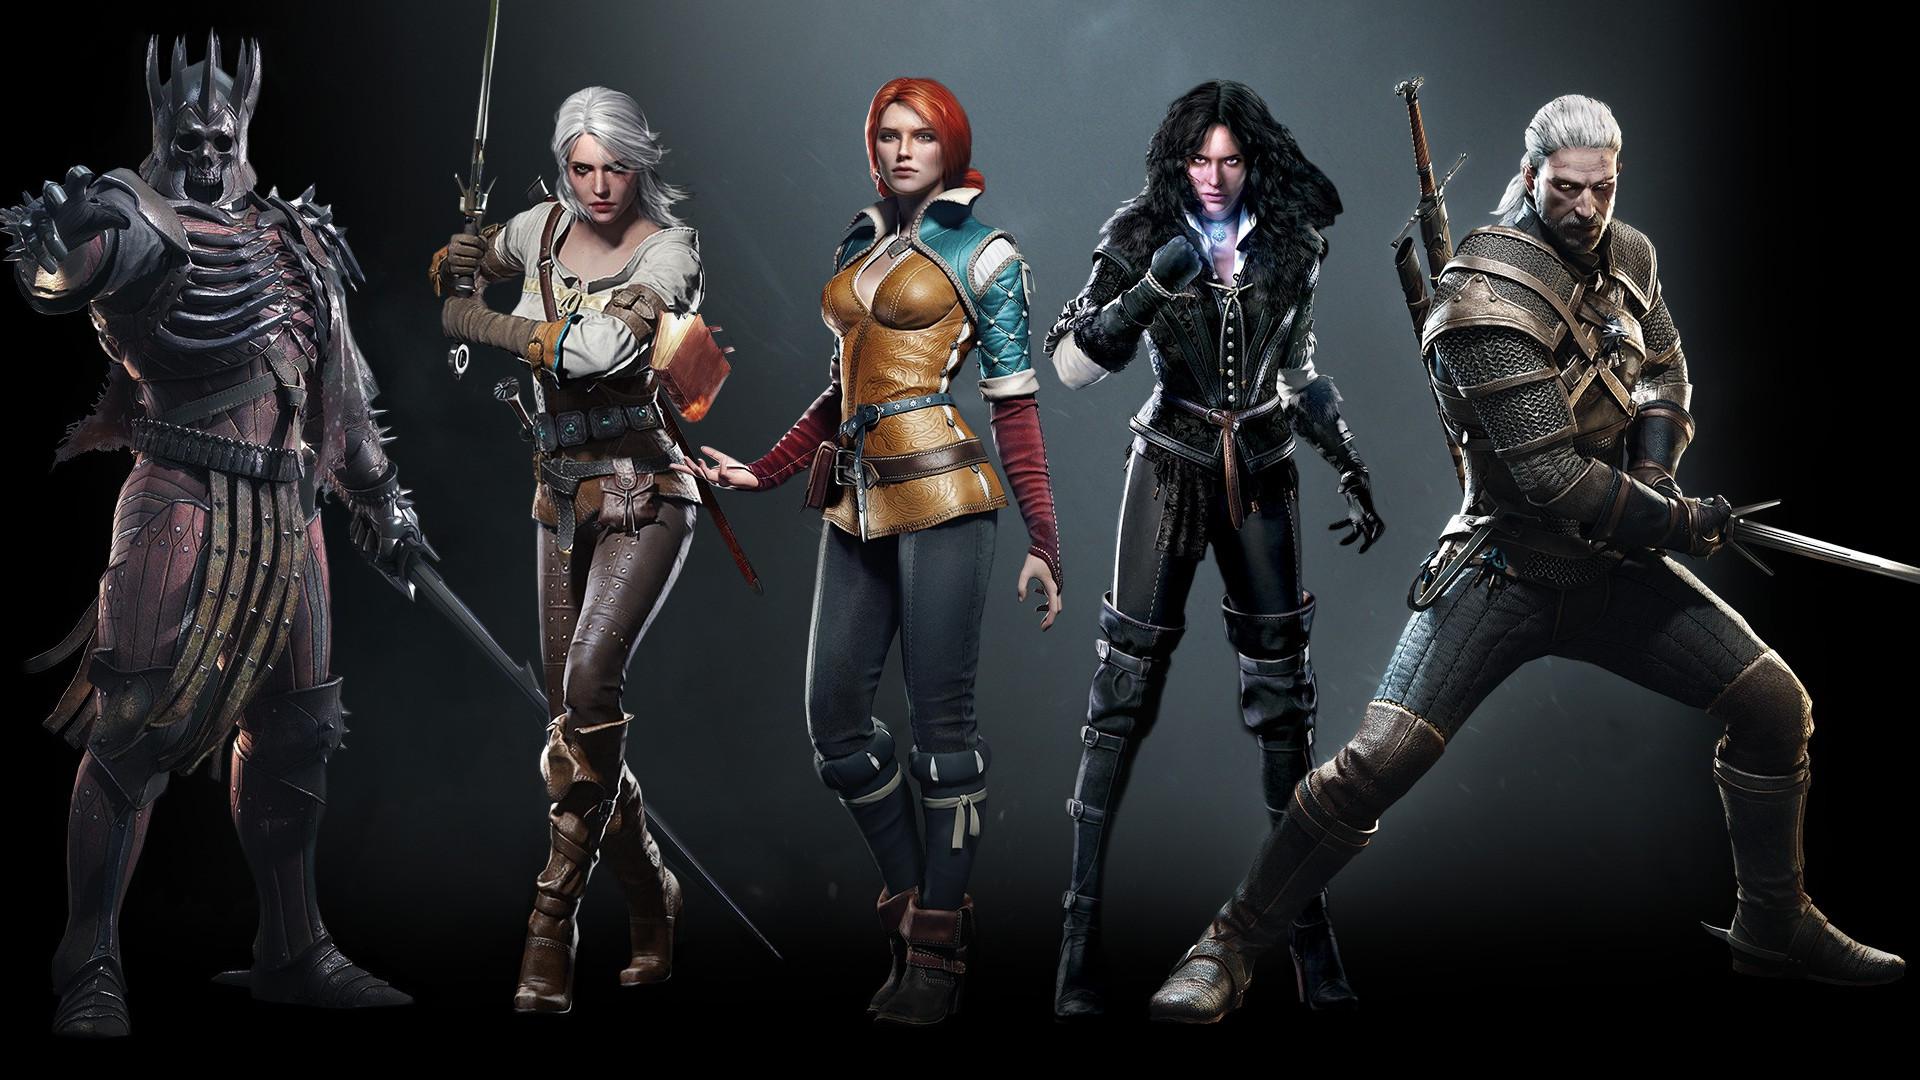 General The Witcher 3: Wild Hunt Eredin Ciri Geralt of Rivia  Yennefer of Vengerberg